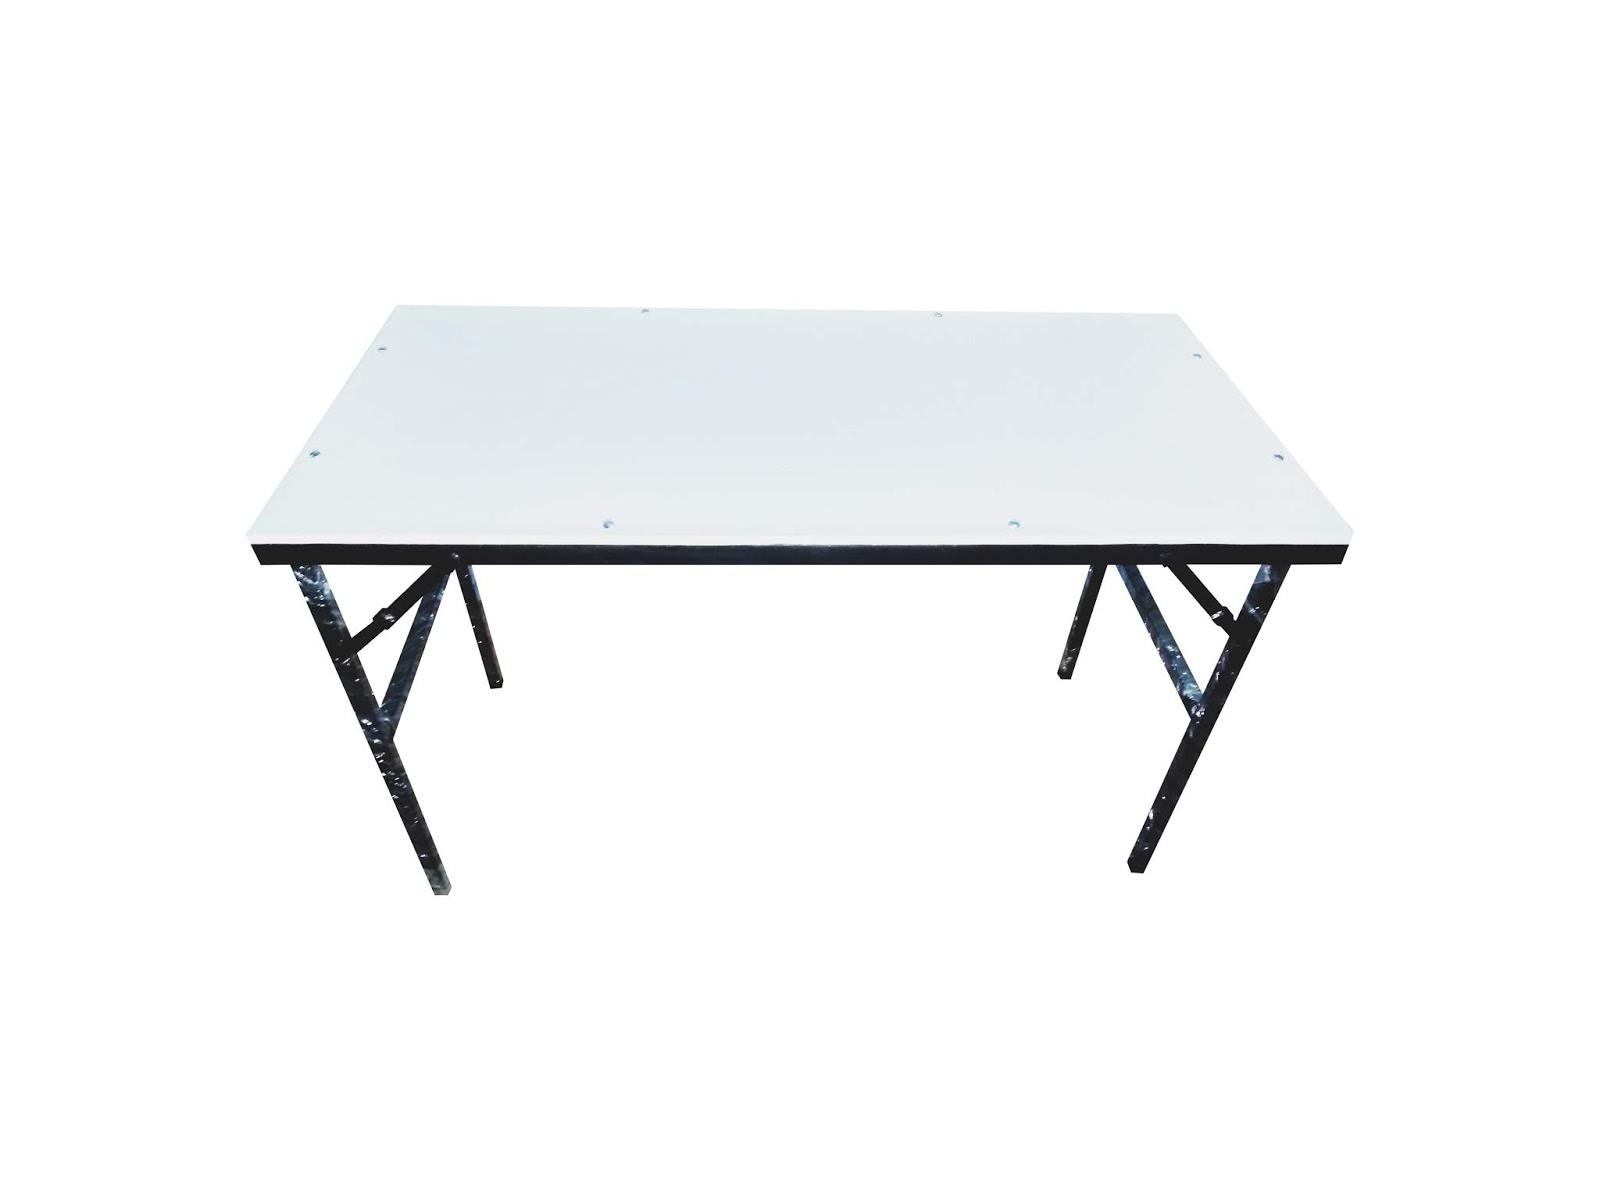 folding table price in vasai rs 1999 per folding table 4 x 2 feet